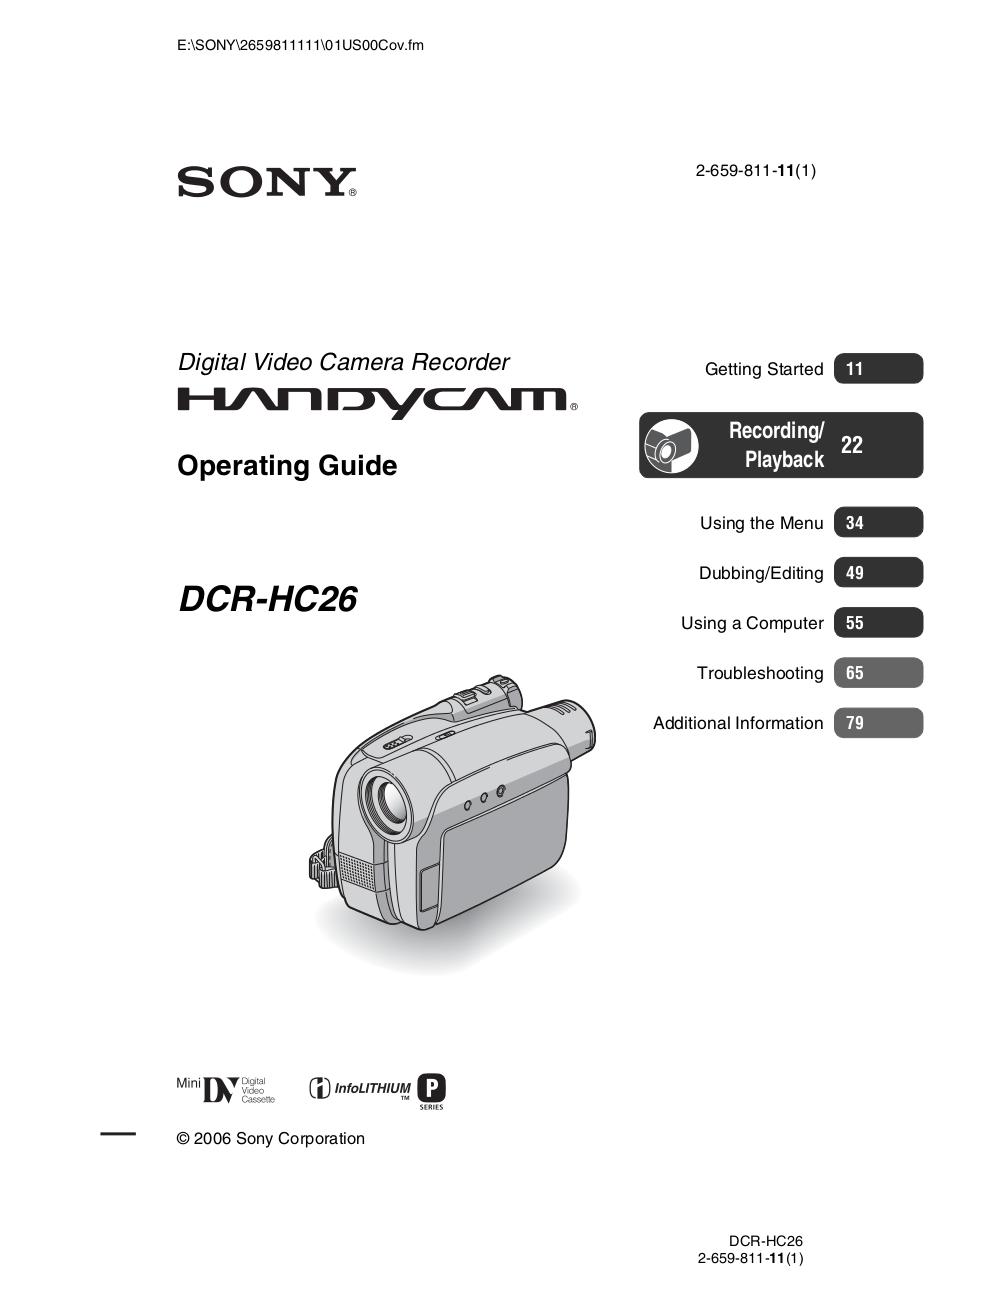 download free pdf for sony handycam dcr hc26 camcorders manual rh umlib com sony handycam user guide sony handycam user guide